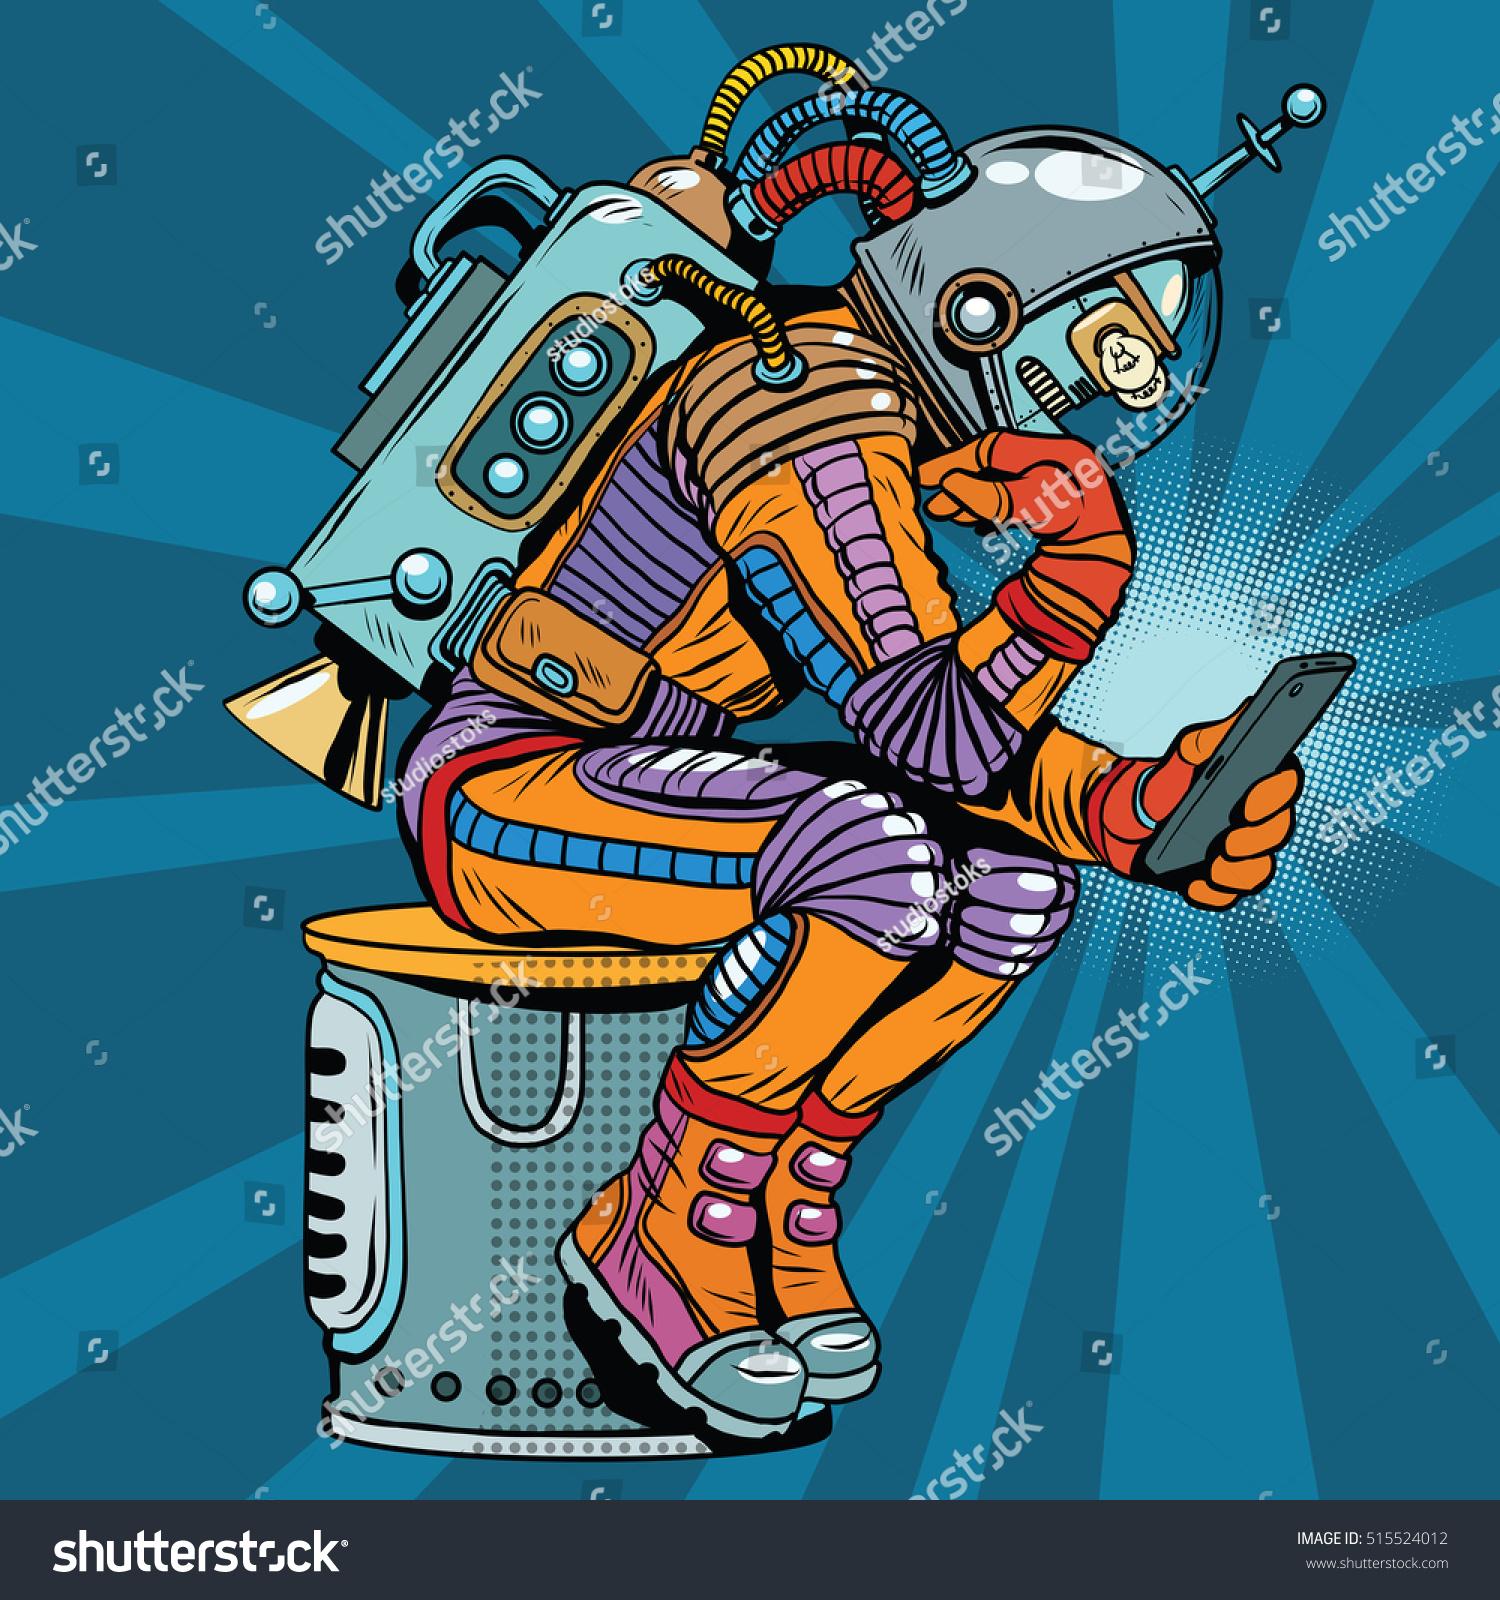 Vintage Sci Fi Illustrations Retro Science Fiction: Retro Robot Astronaut Thinker Pose Reads Stock Vector